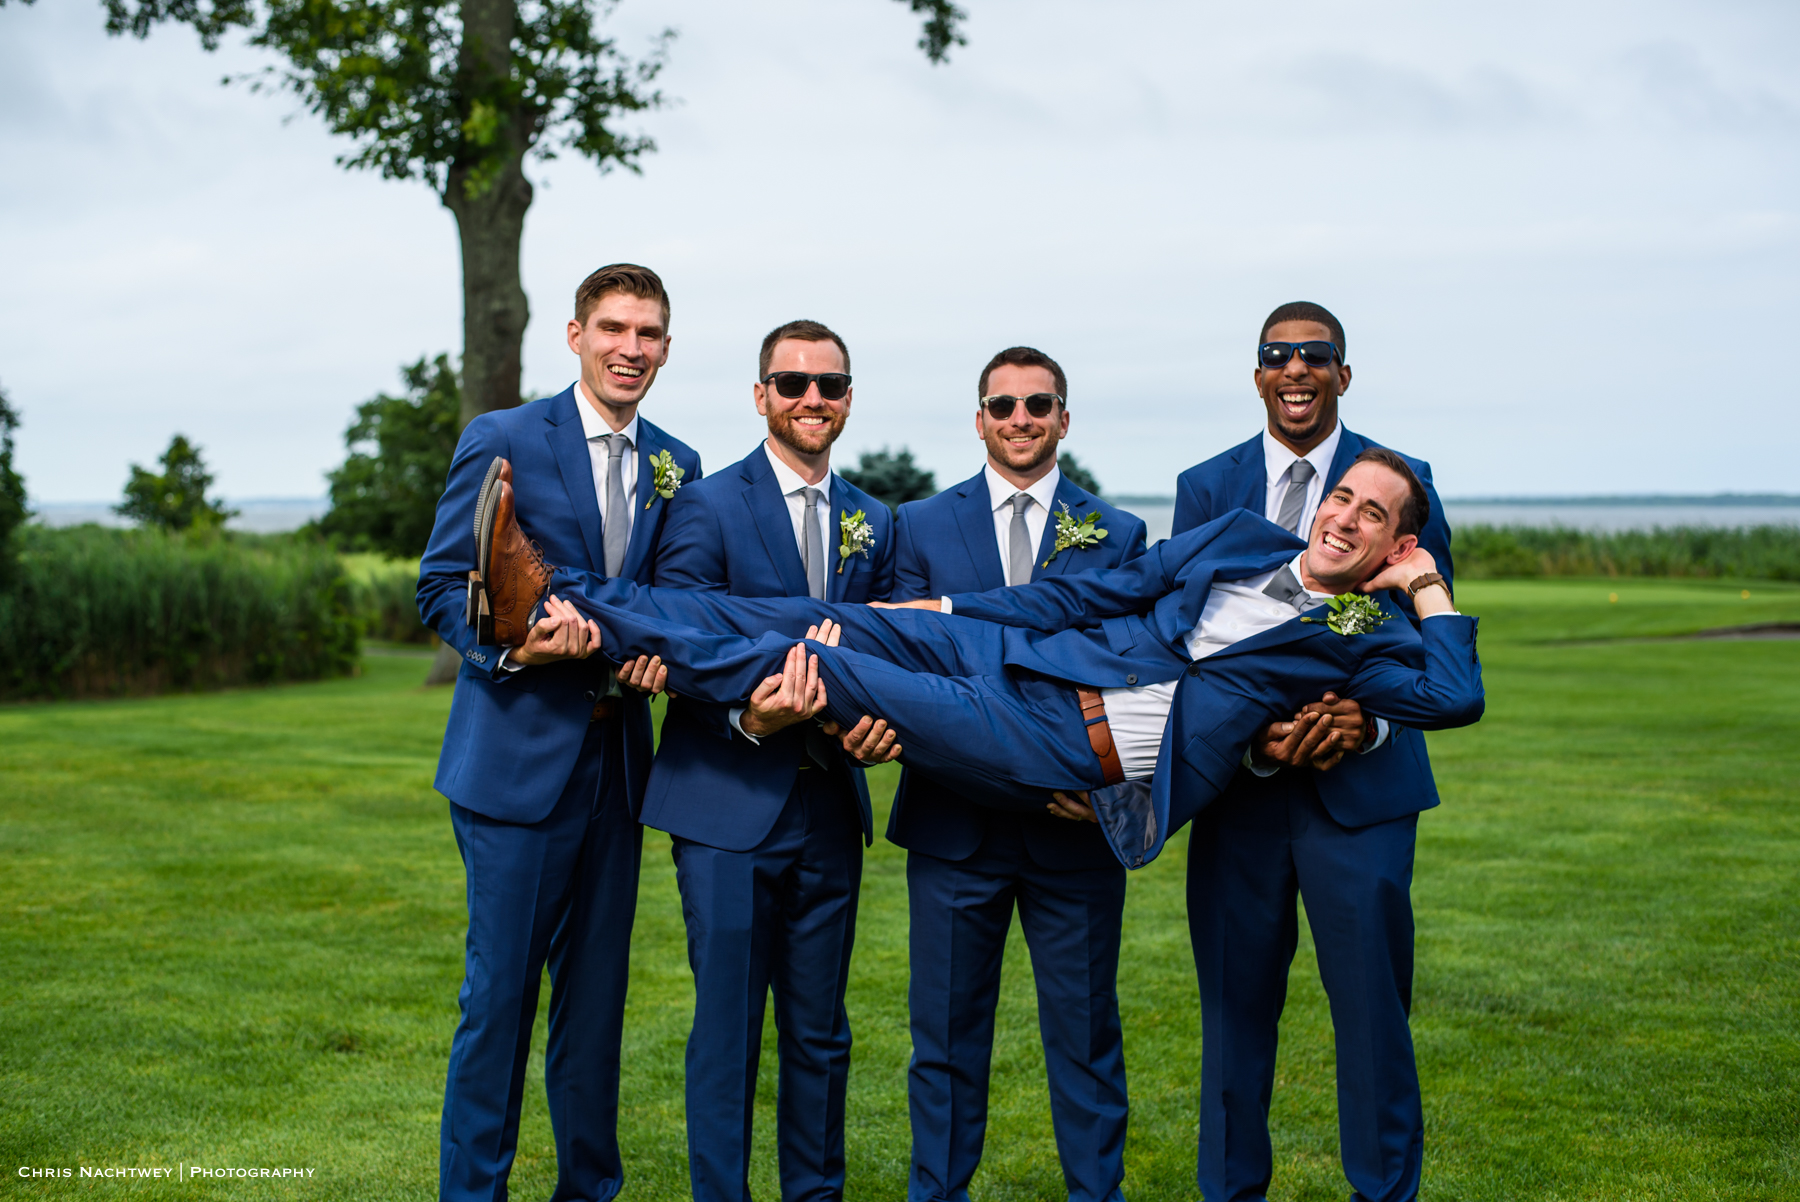 photos-wedding-quidnessett-country-club-ri-chris-nachtwey-photography-2018-34.jpg